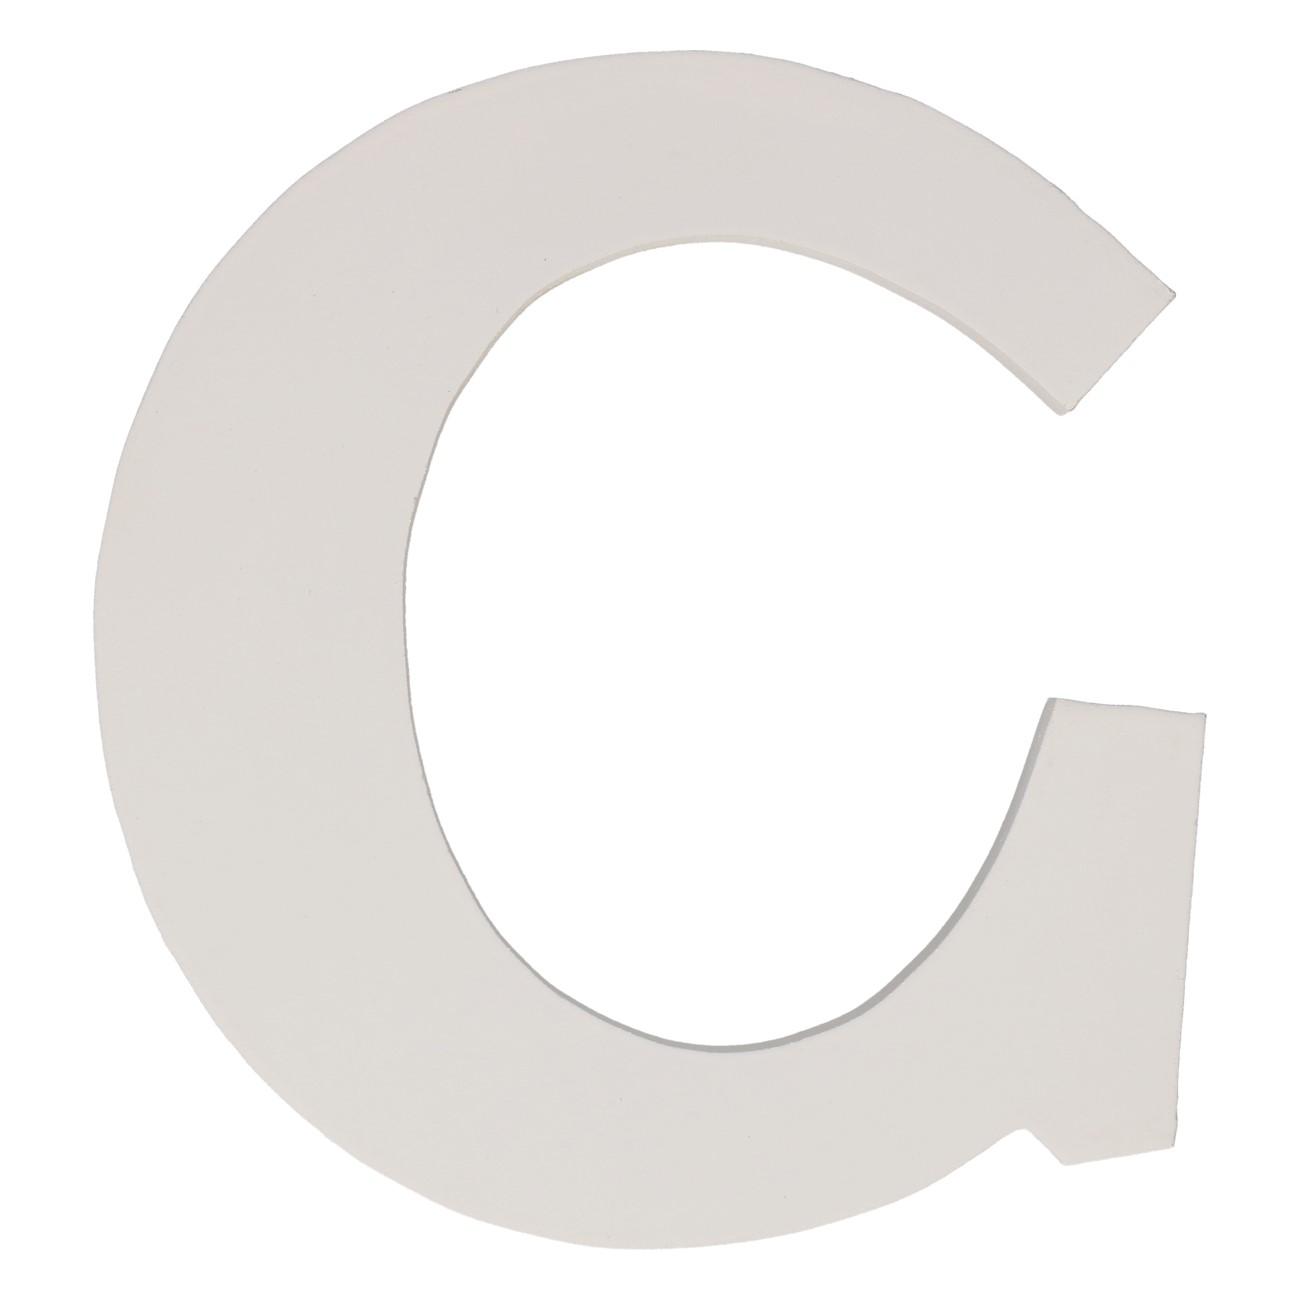 Letter mdf c (12cm)